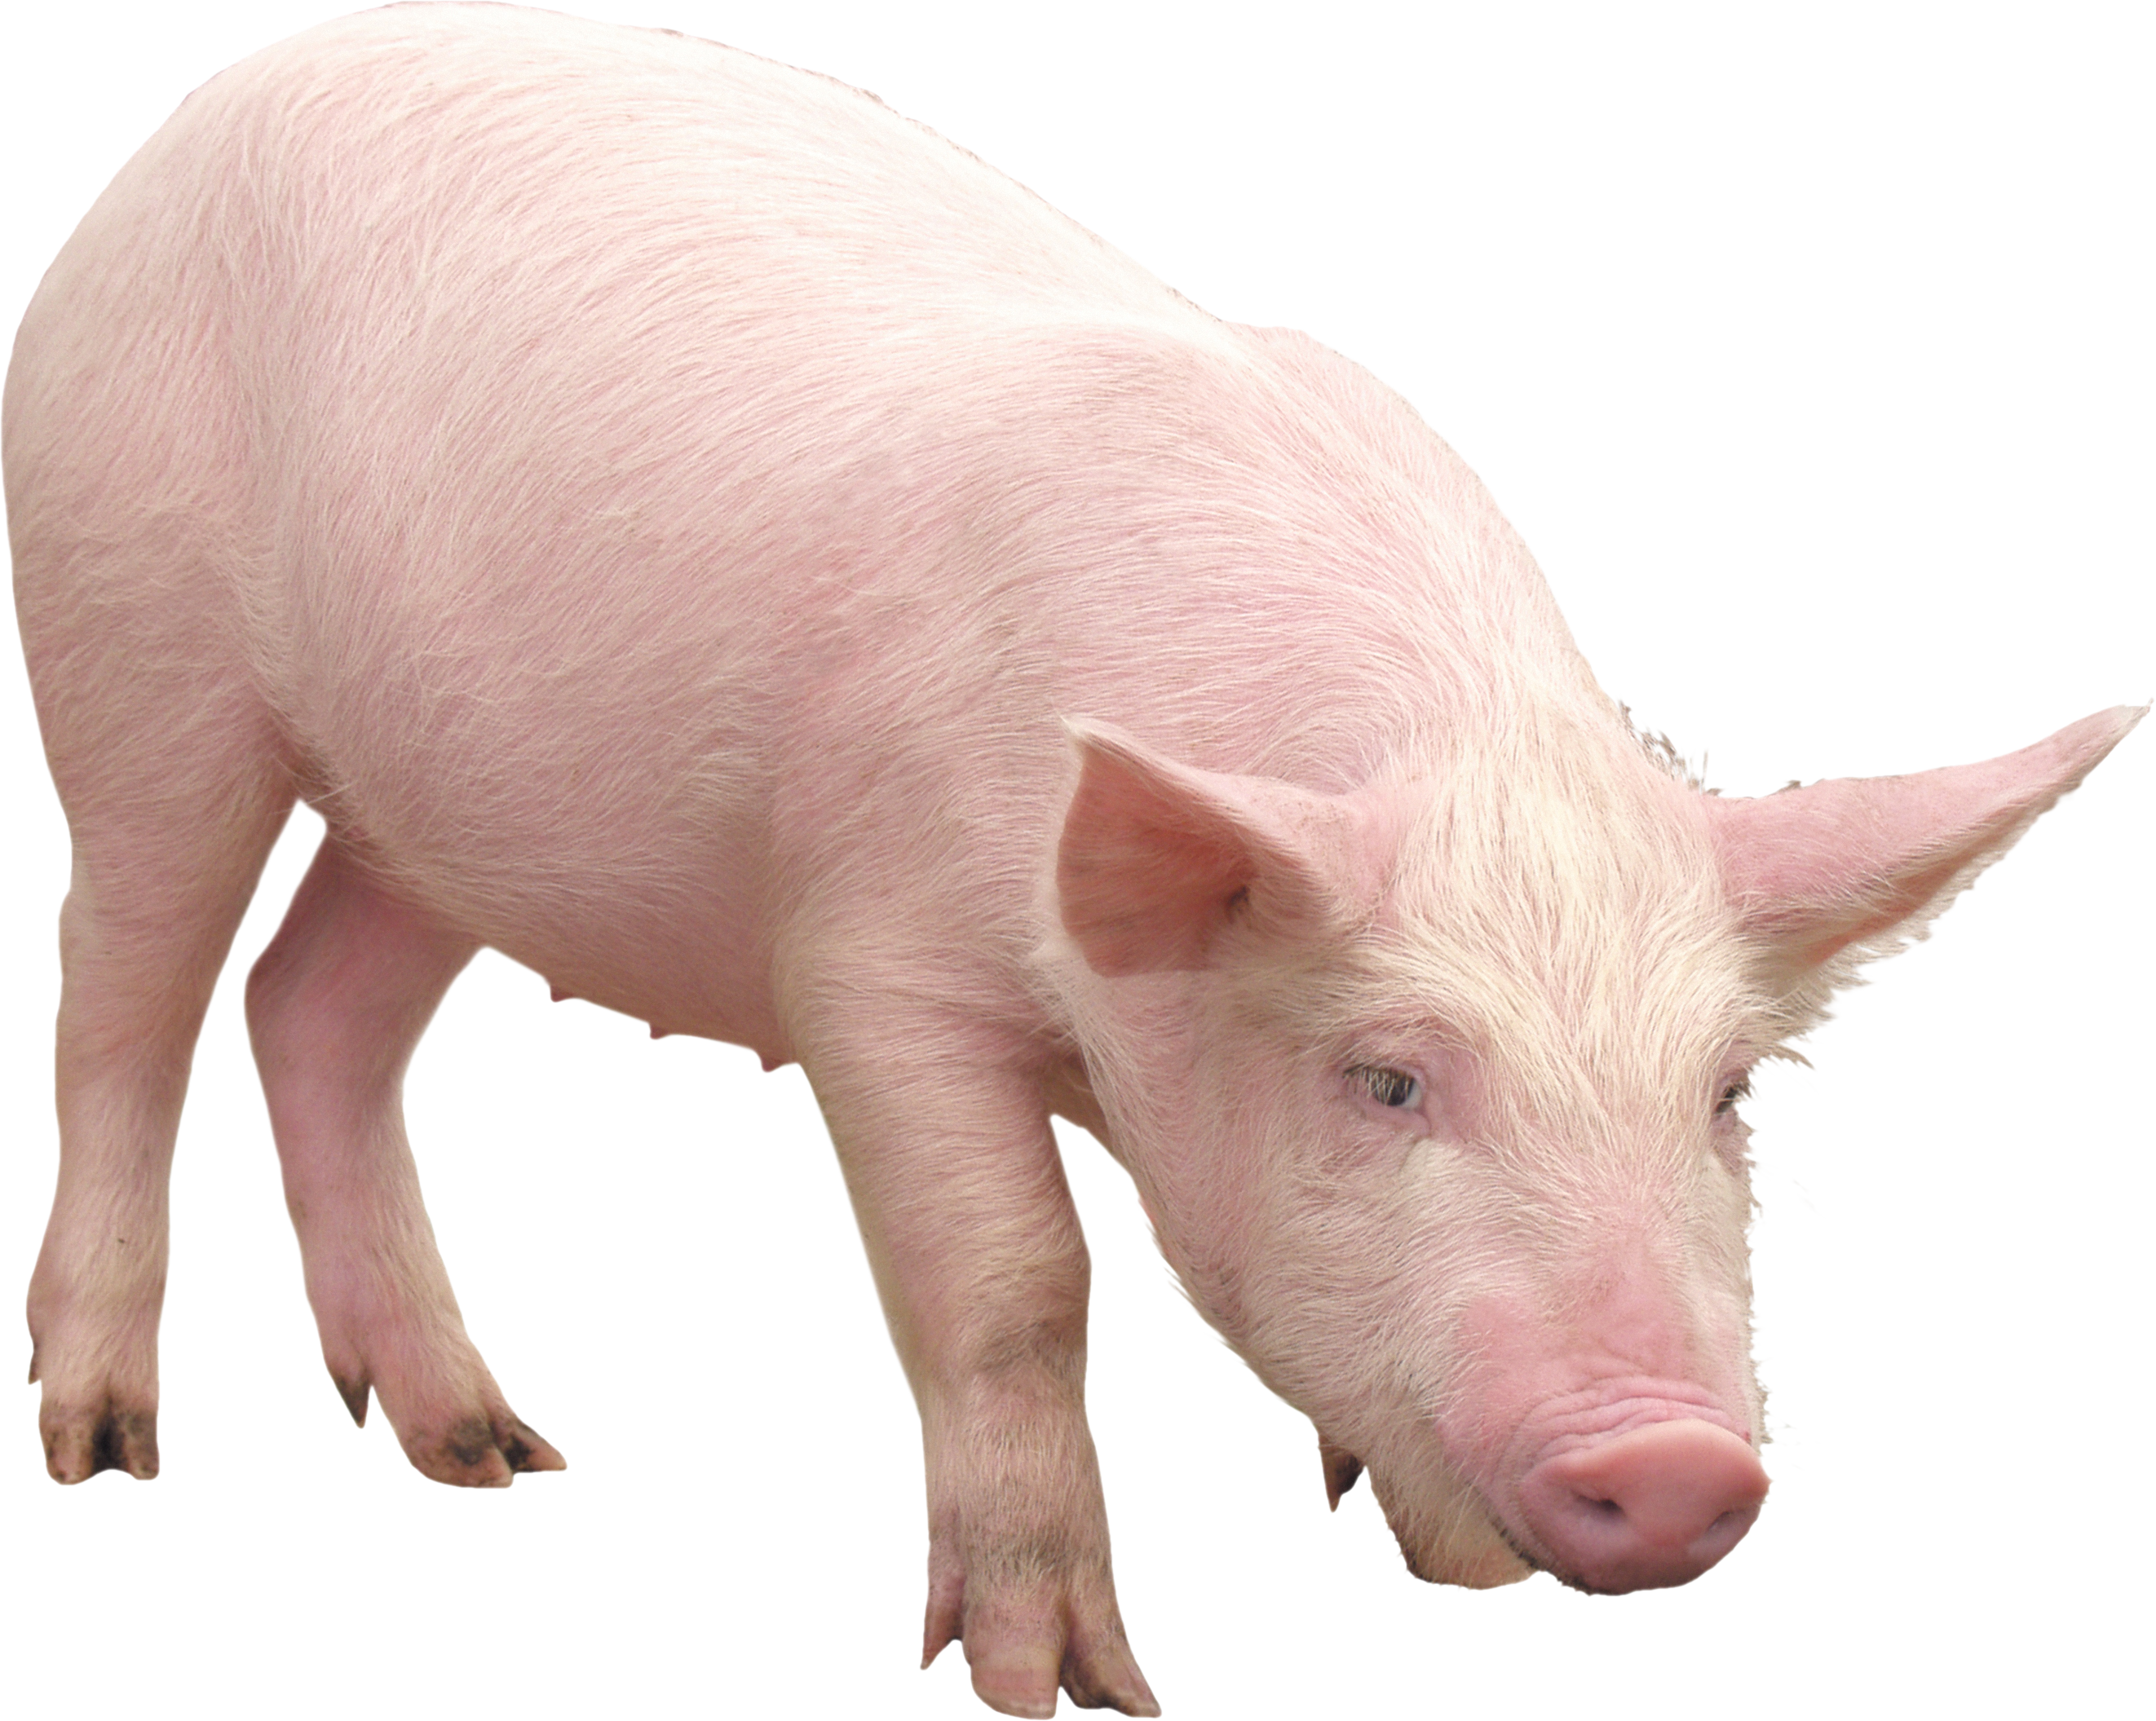 pink pig PNG image - Pig PNG